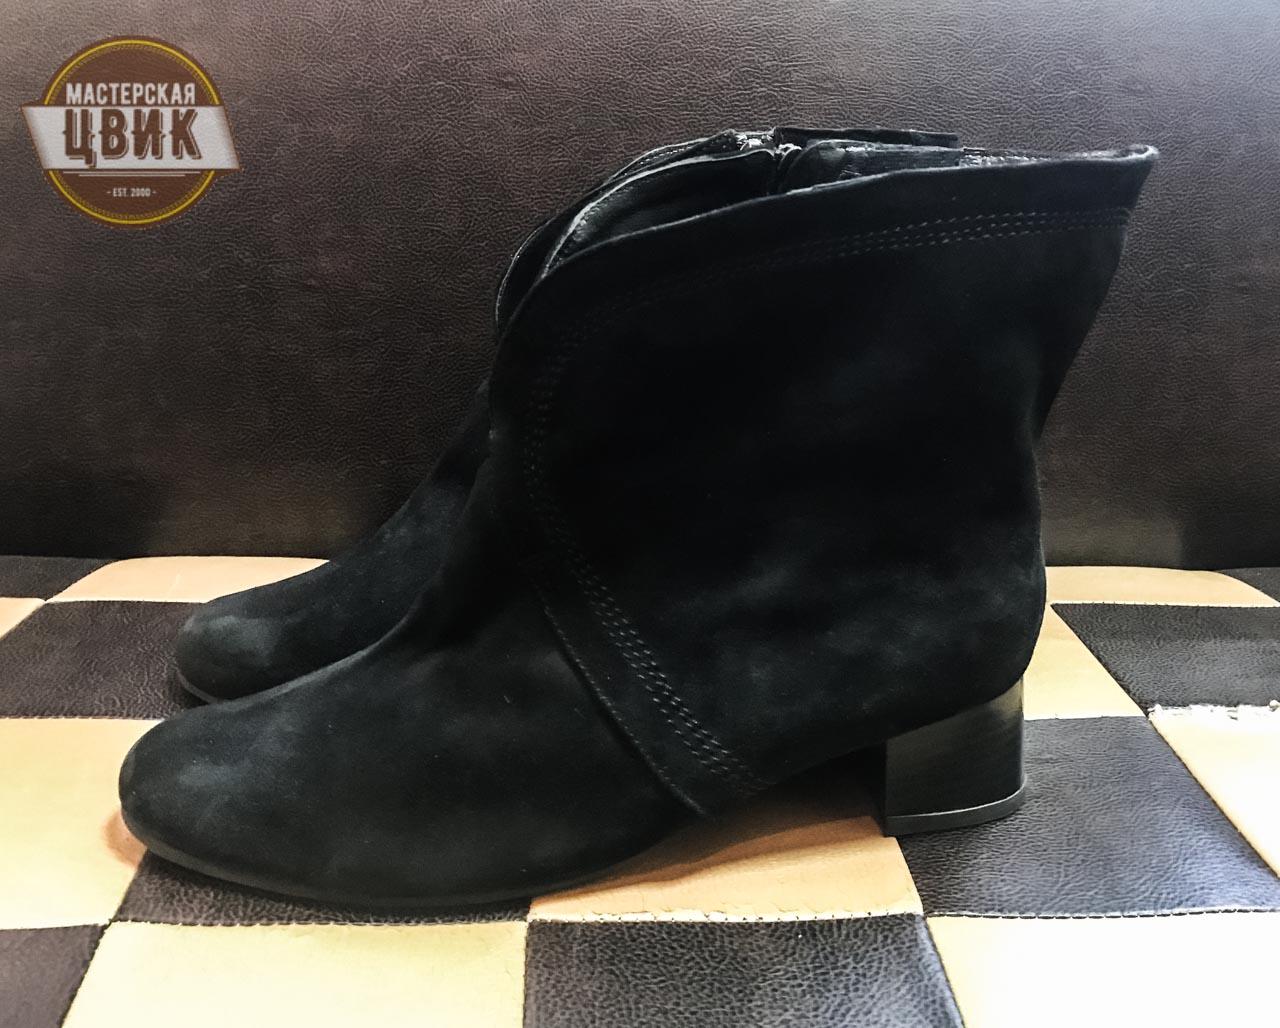 individualnyj-poshiv-obuvi-minsk-5 Индивидуальный пошив обуви